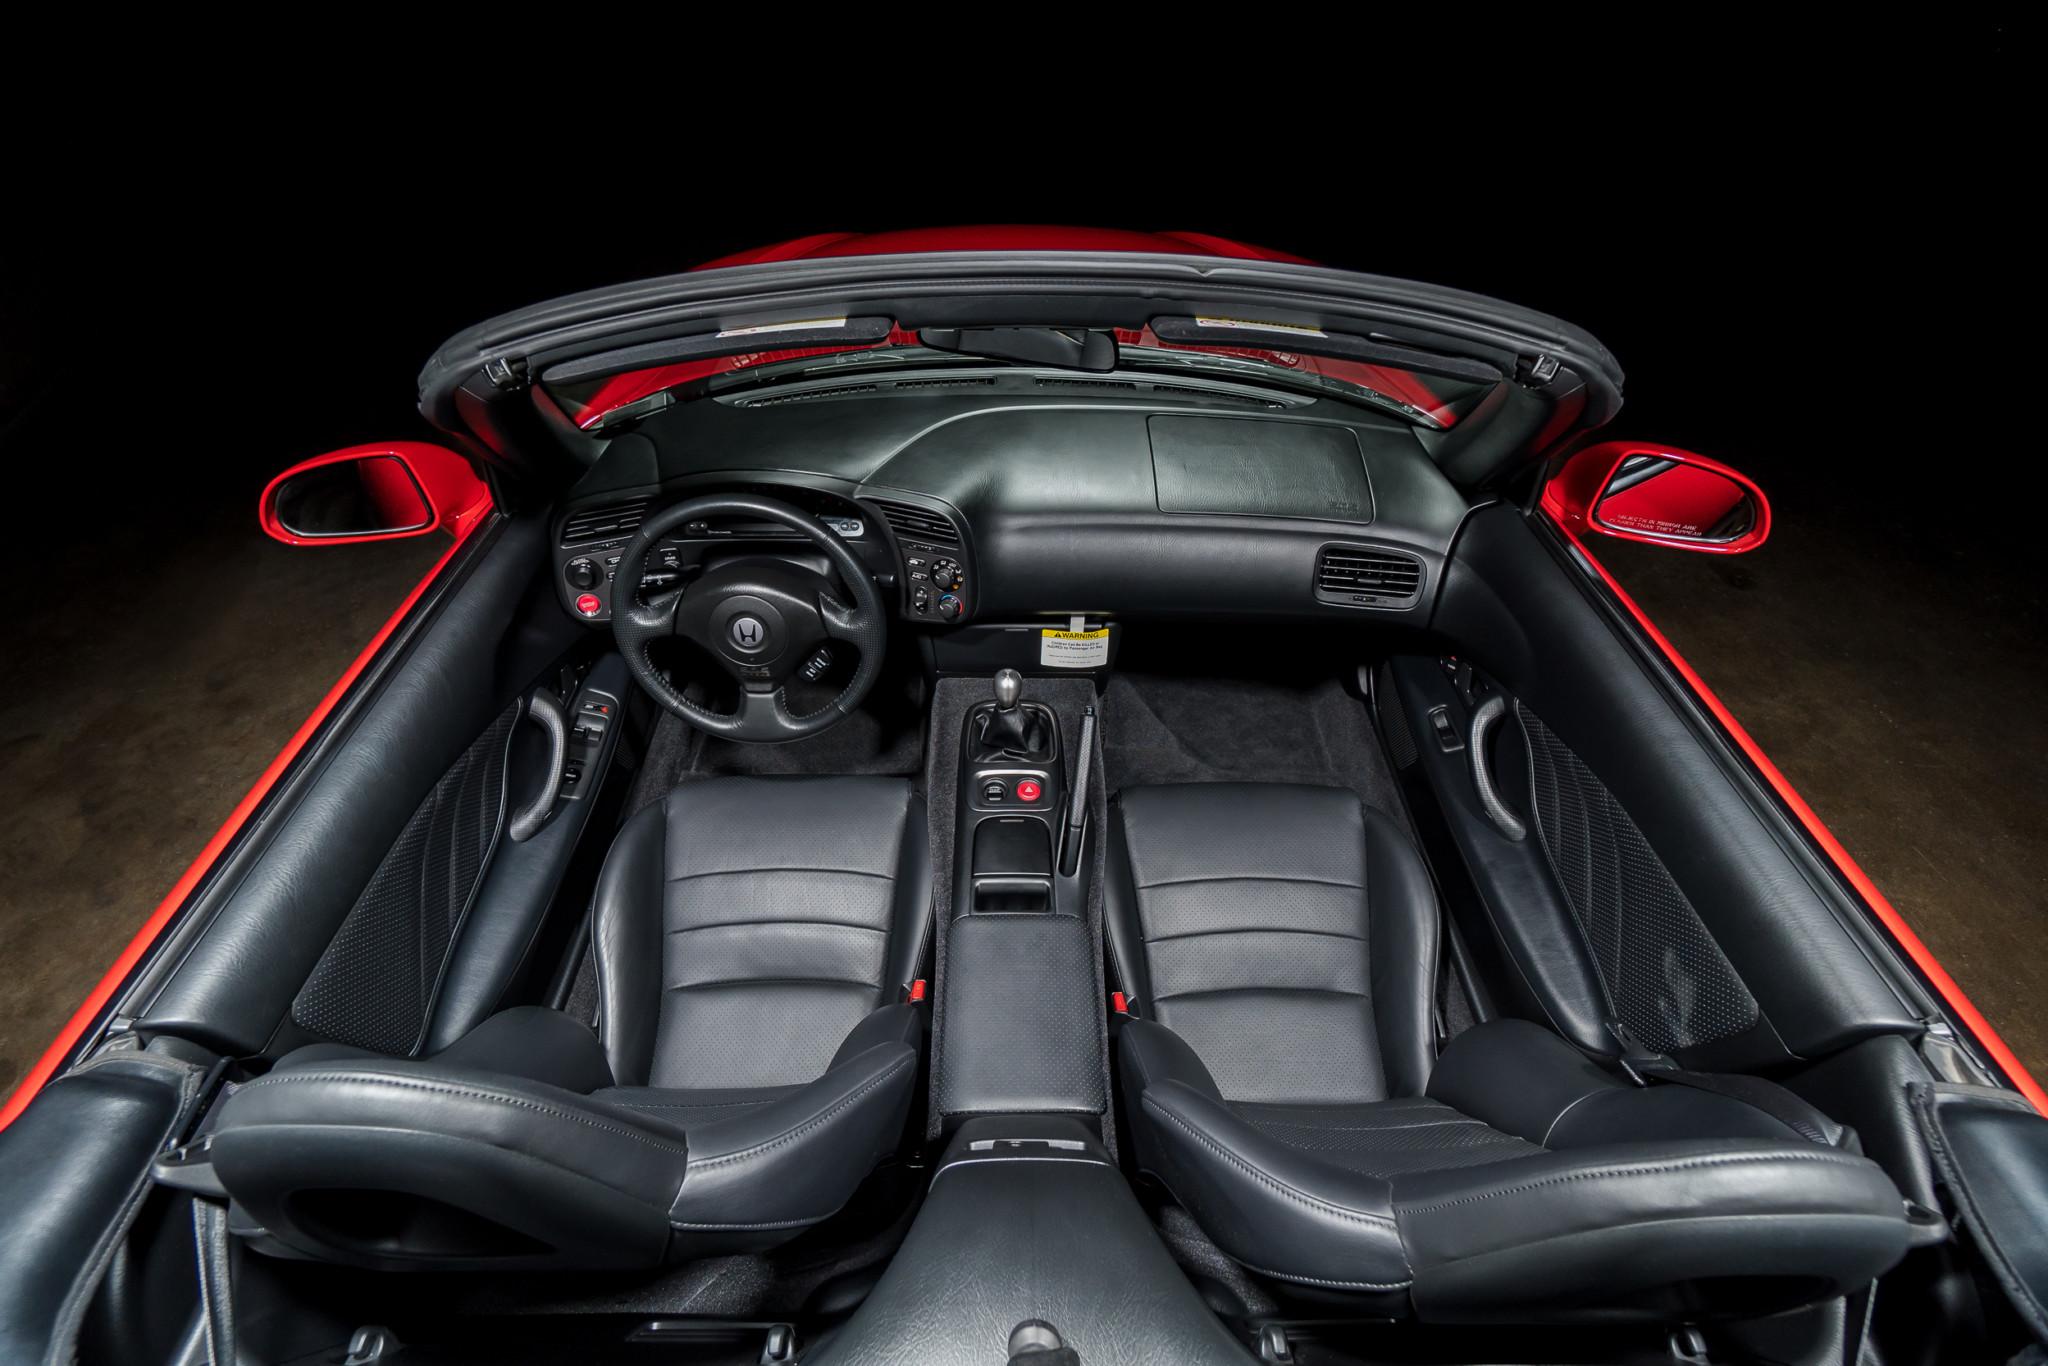 2000 Honda S2000 Interior top